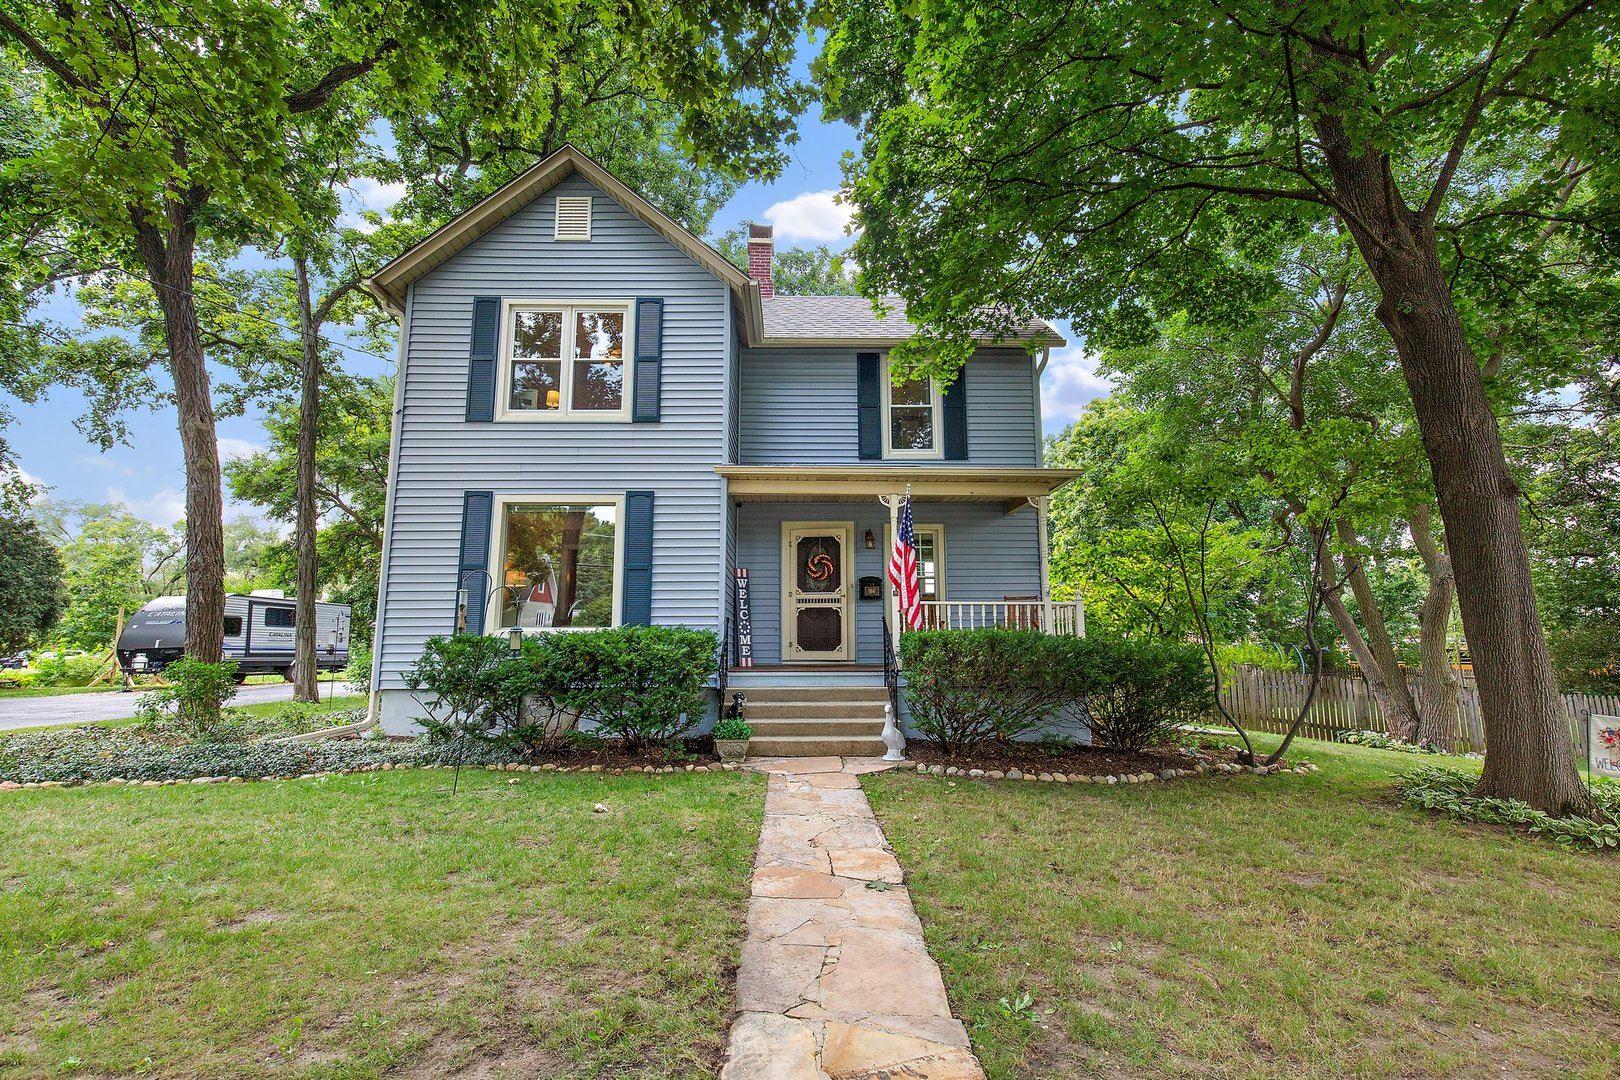 166 N Oak Street, Crystal Lake, IL 60014 - #: 11196166